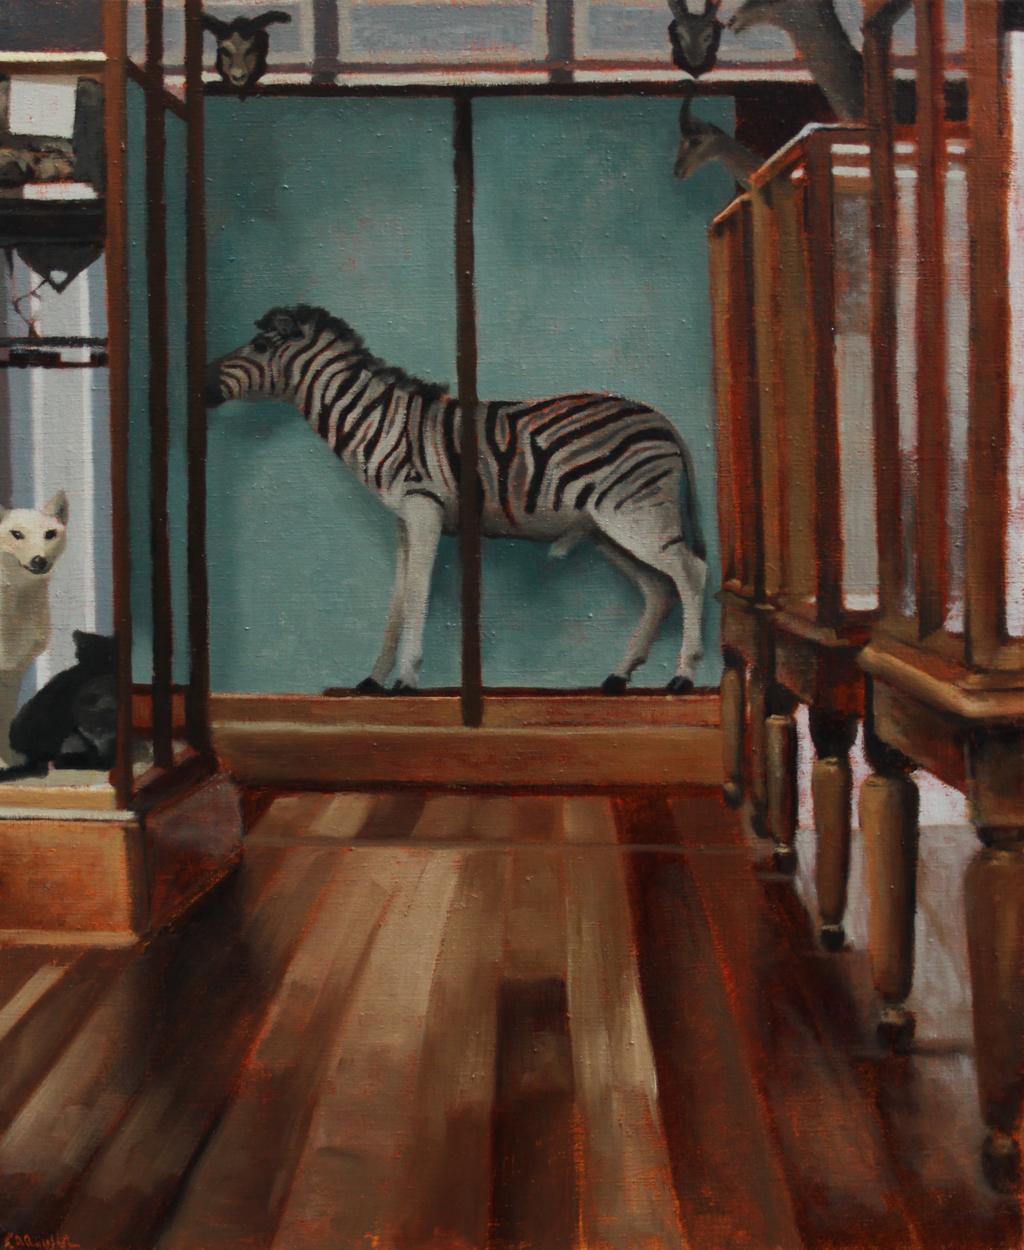 Zebra Gardiner. Simple Zebra Gardiner X Cm Gr With Zebra Gardiner. Kettle Chips Louise Gardiner ...